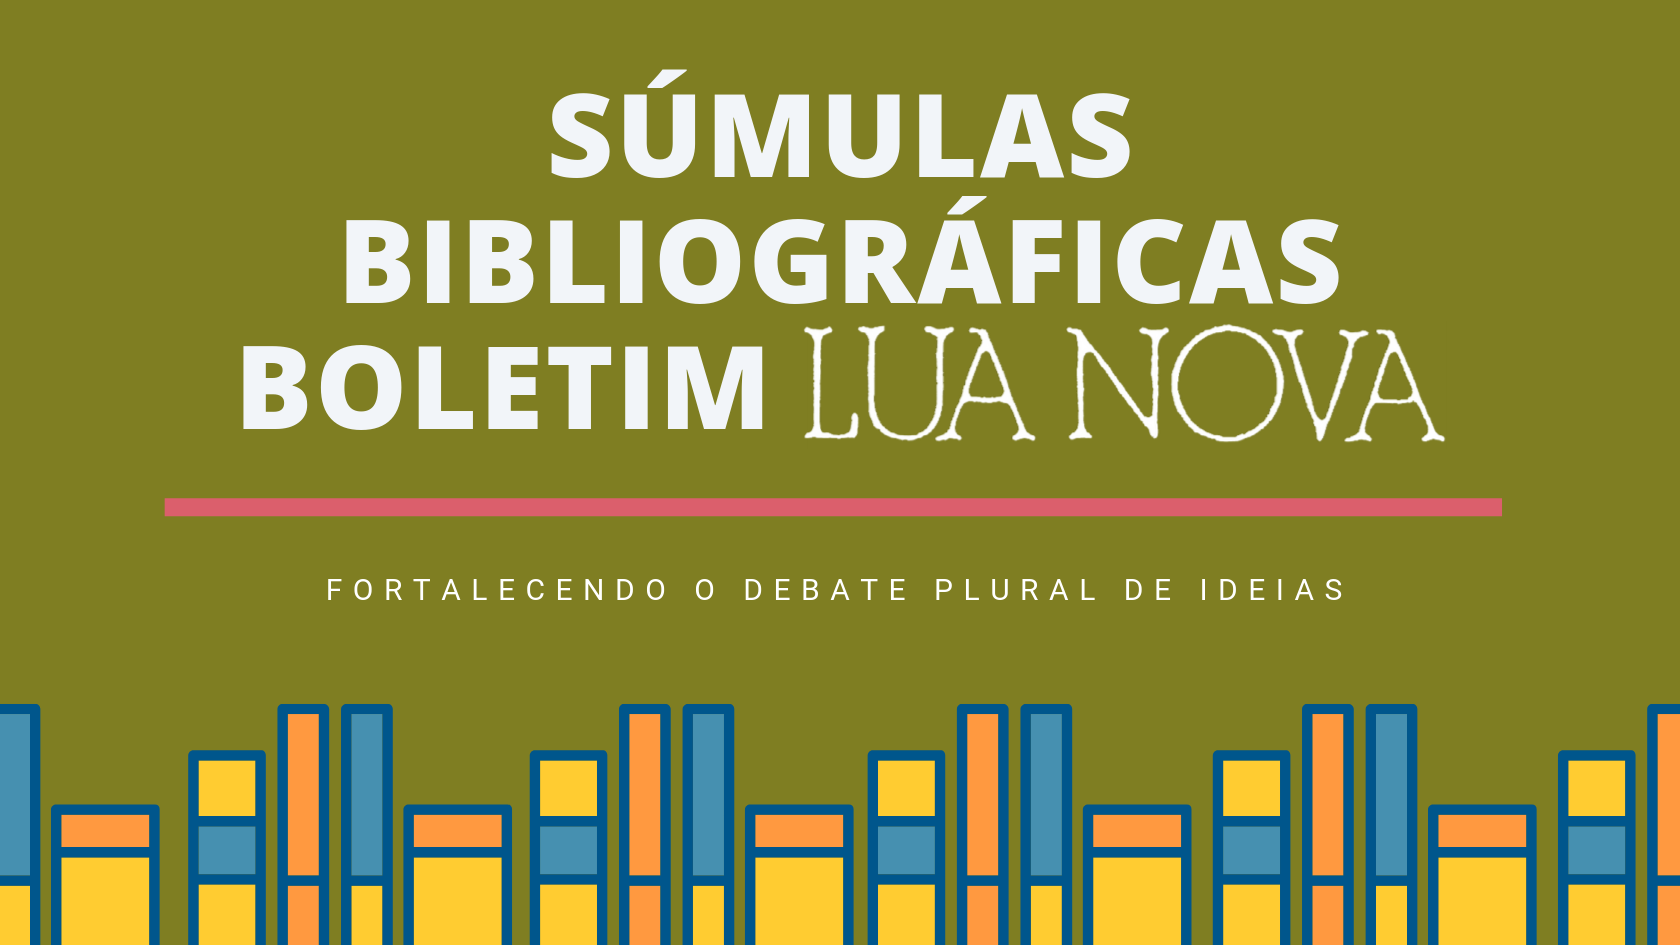 SÚMULAS BIBLIOGRÁFICAS BOLETIM LUA NOVA (1)